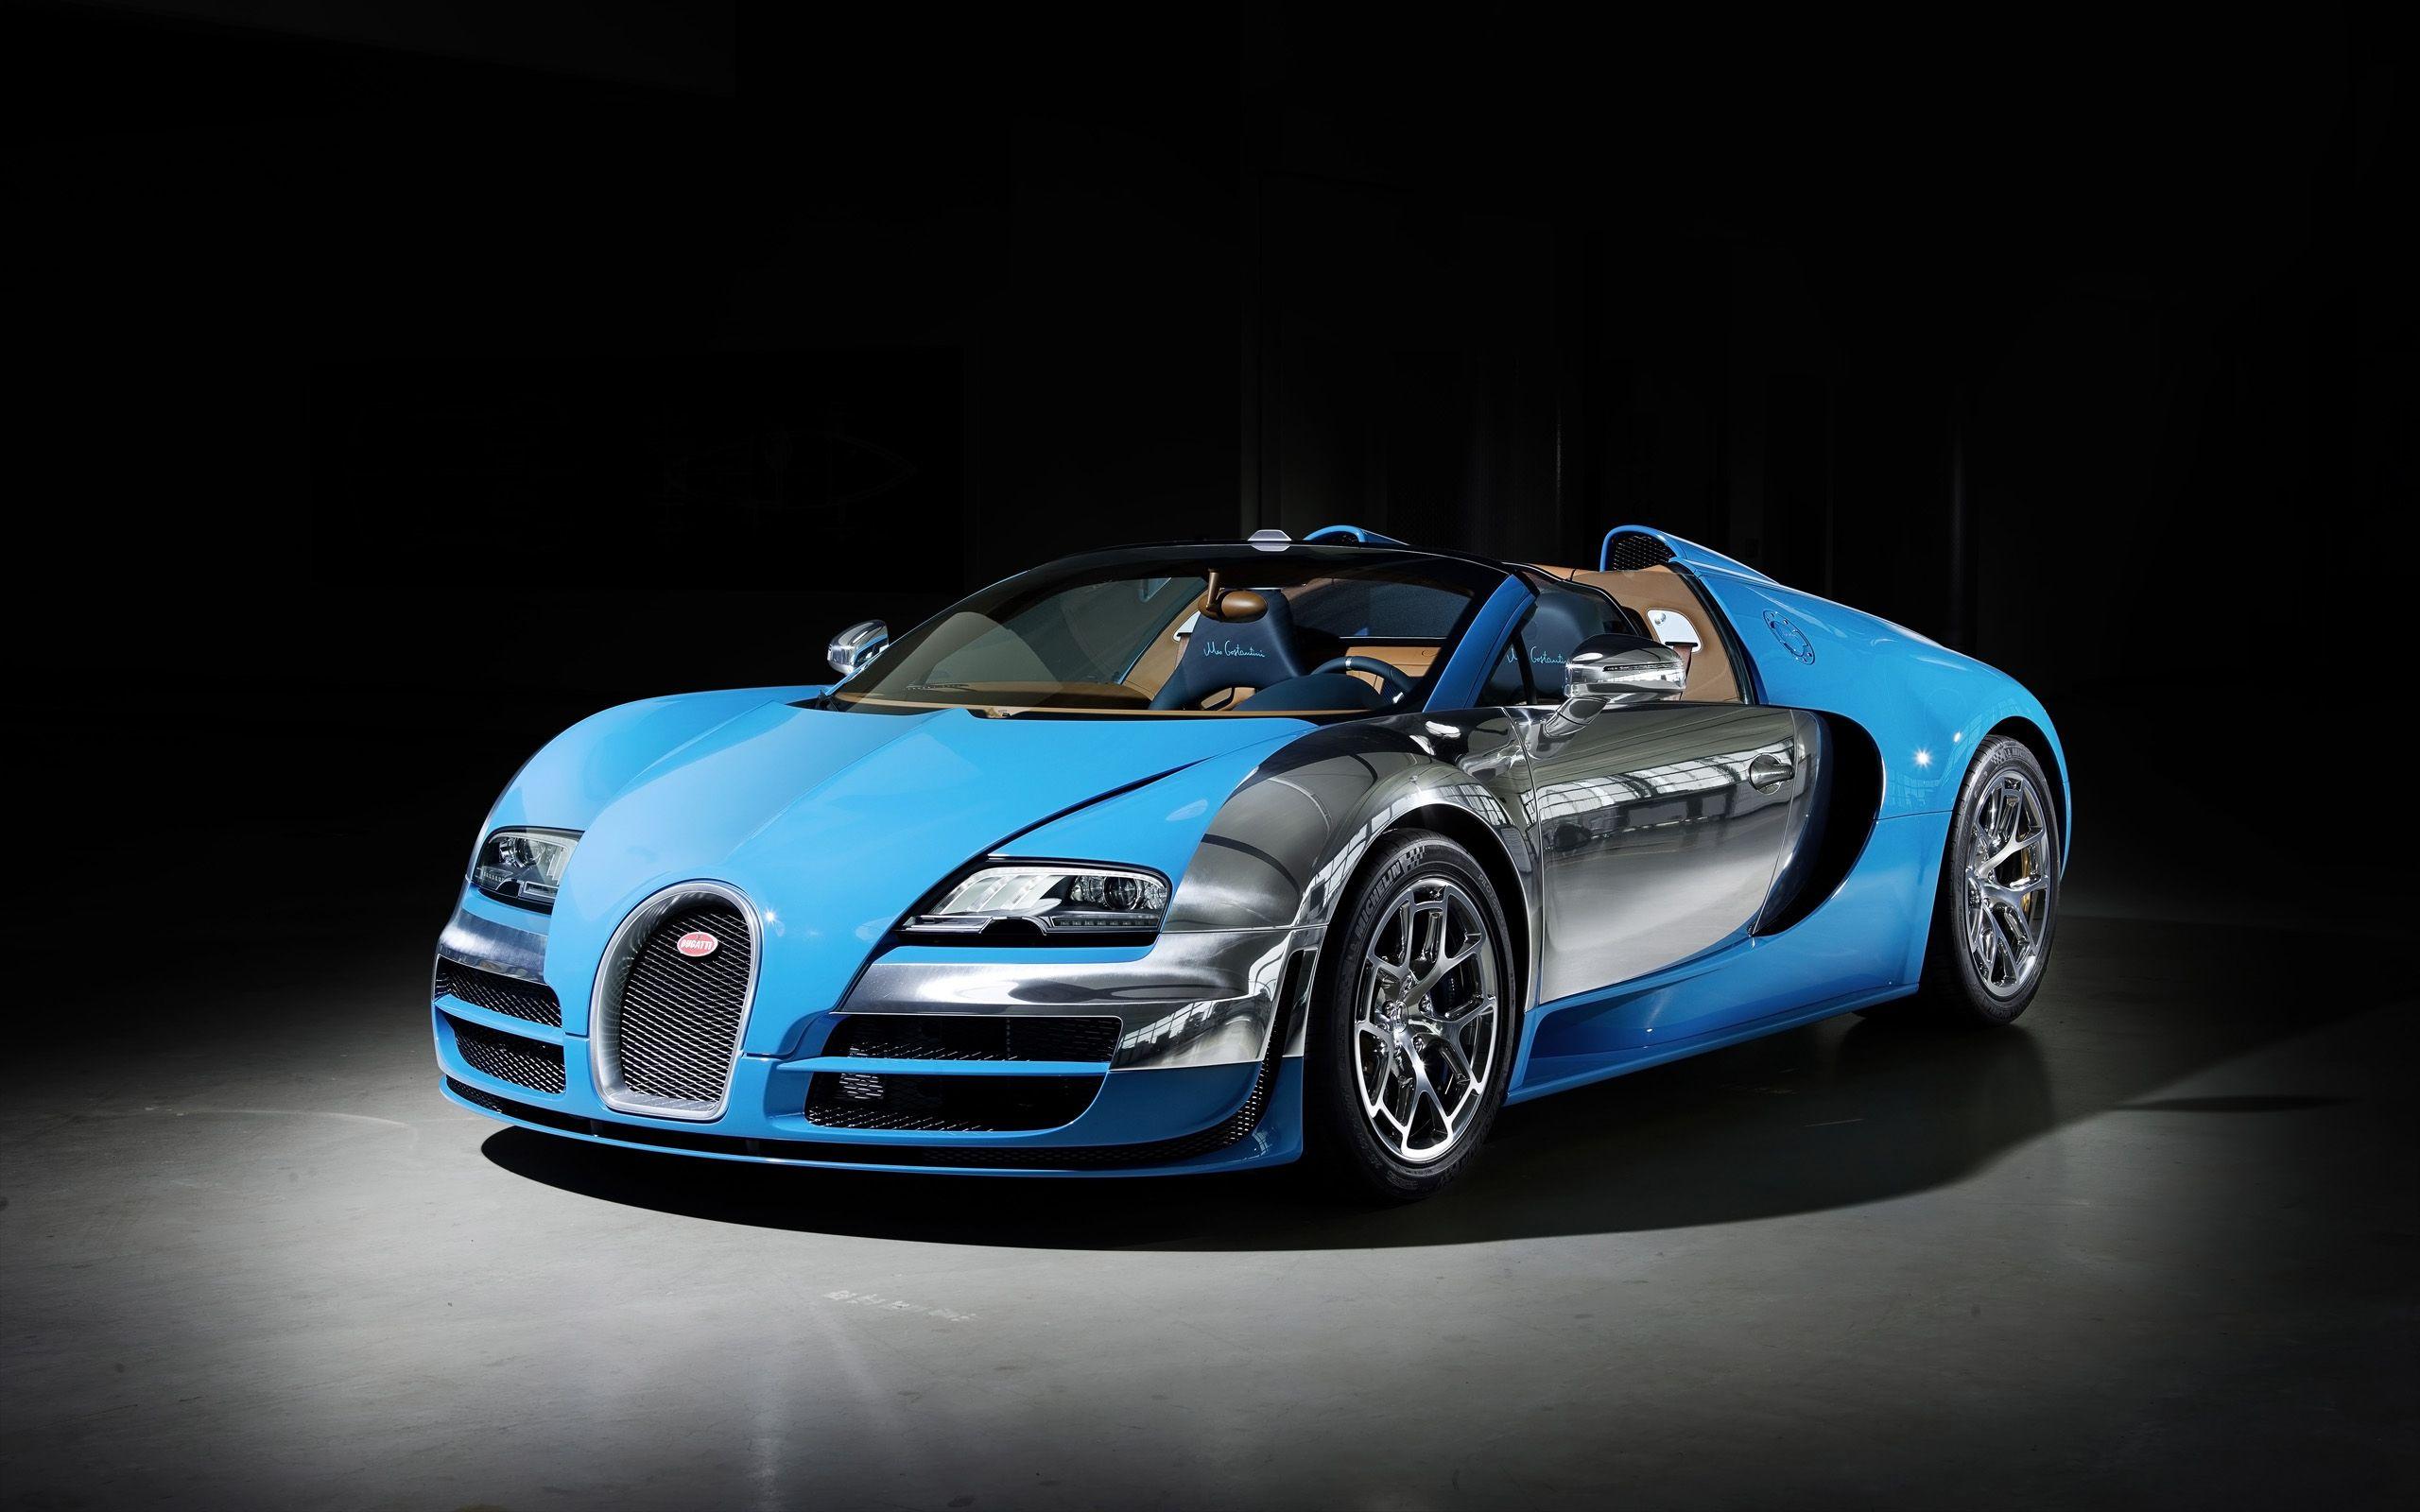 2013 Bugatti Veyron Grand Sport Vitesse Wallpapers Hd Wallpapers